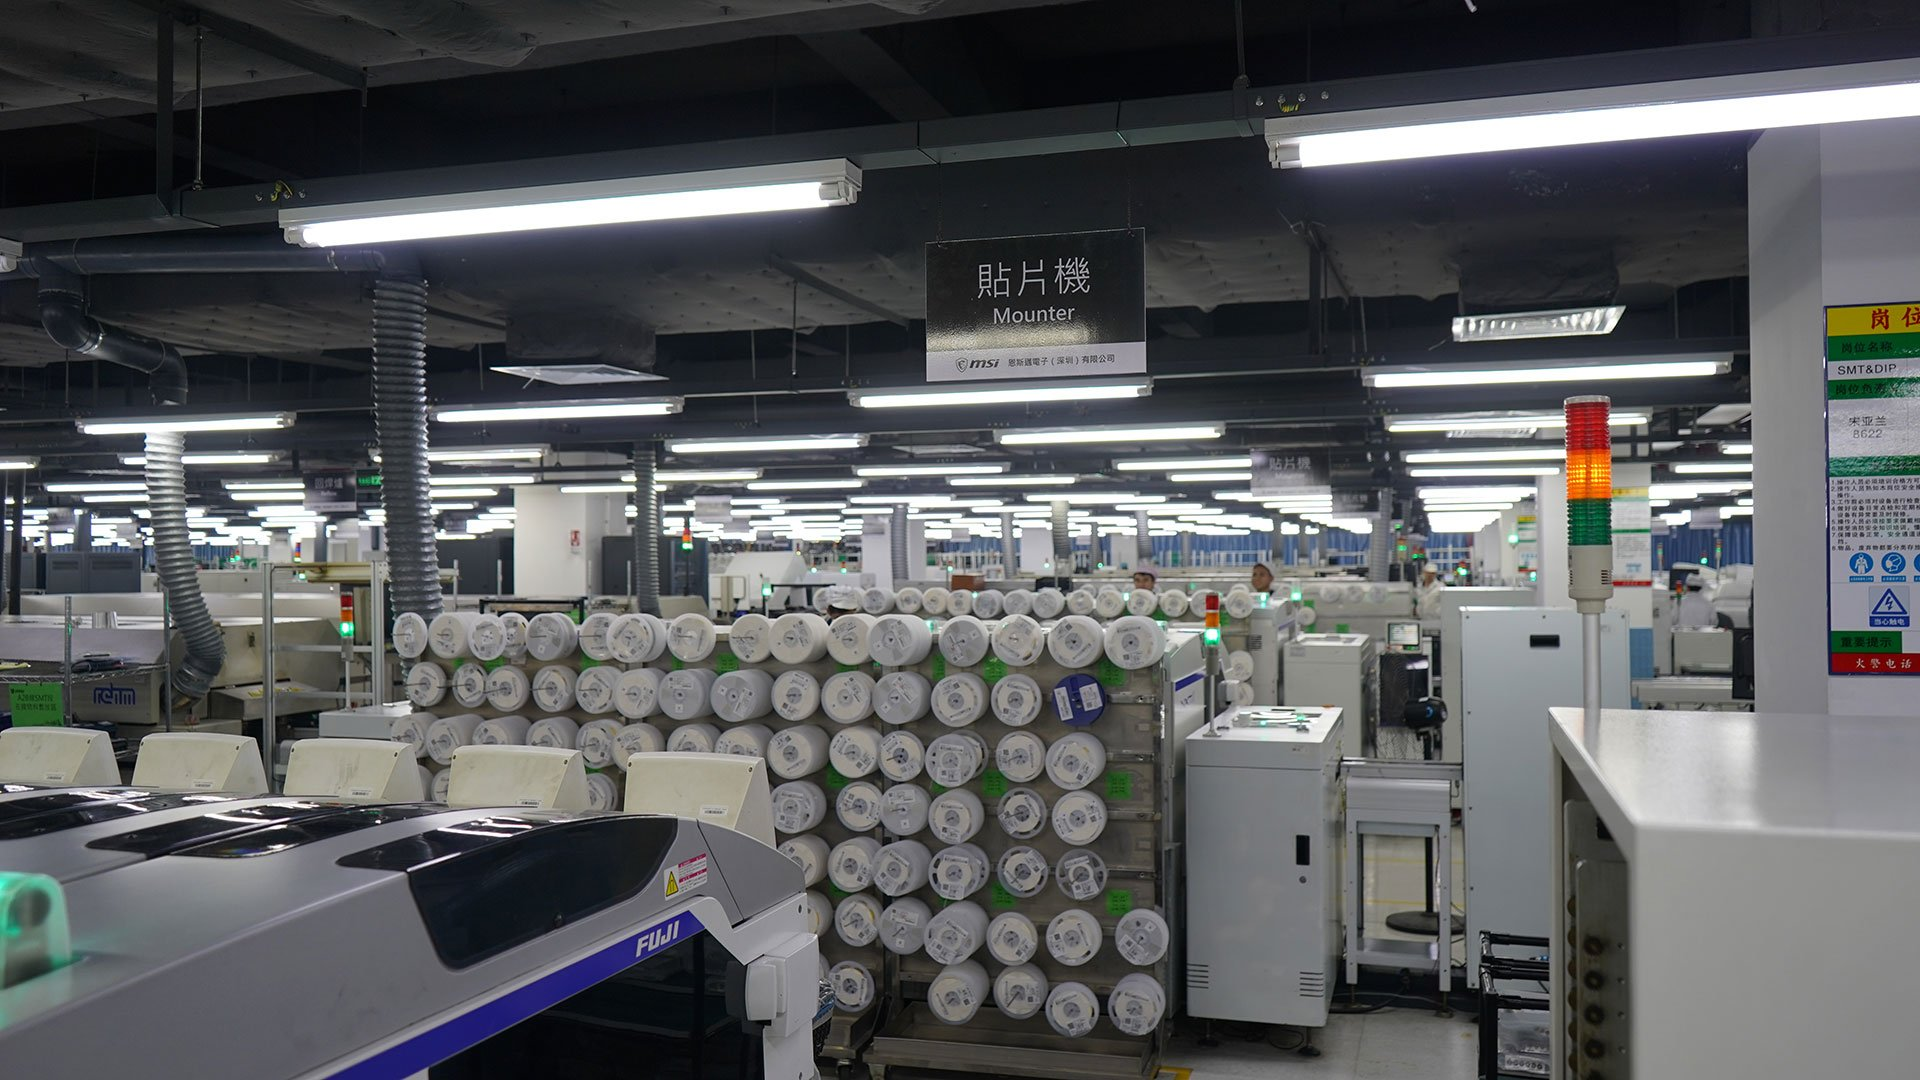 MSI Factory Tour Fertigungshalle